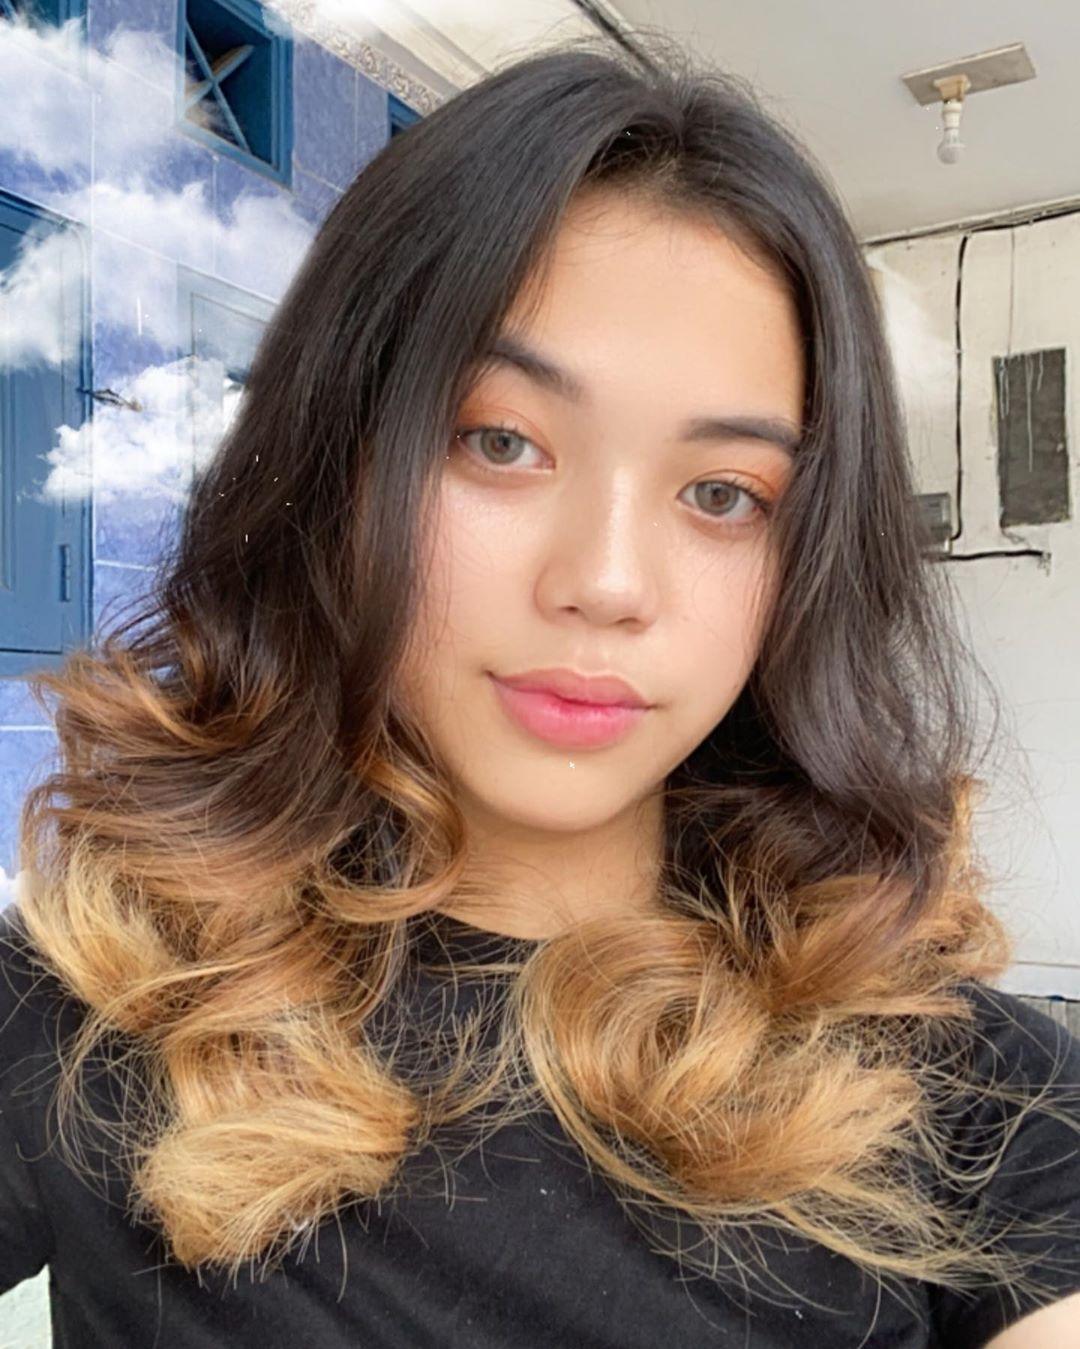 @ivana.putri.arzalia Instagram Analytics